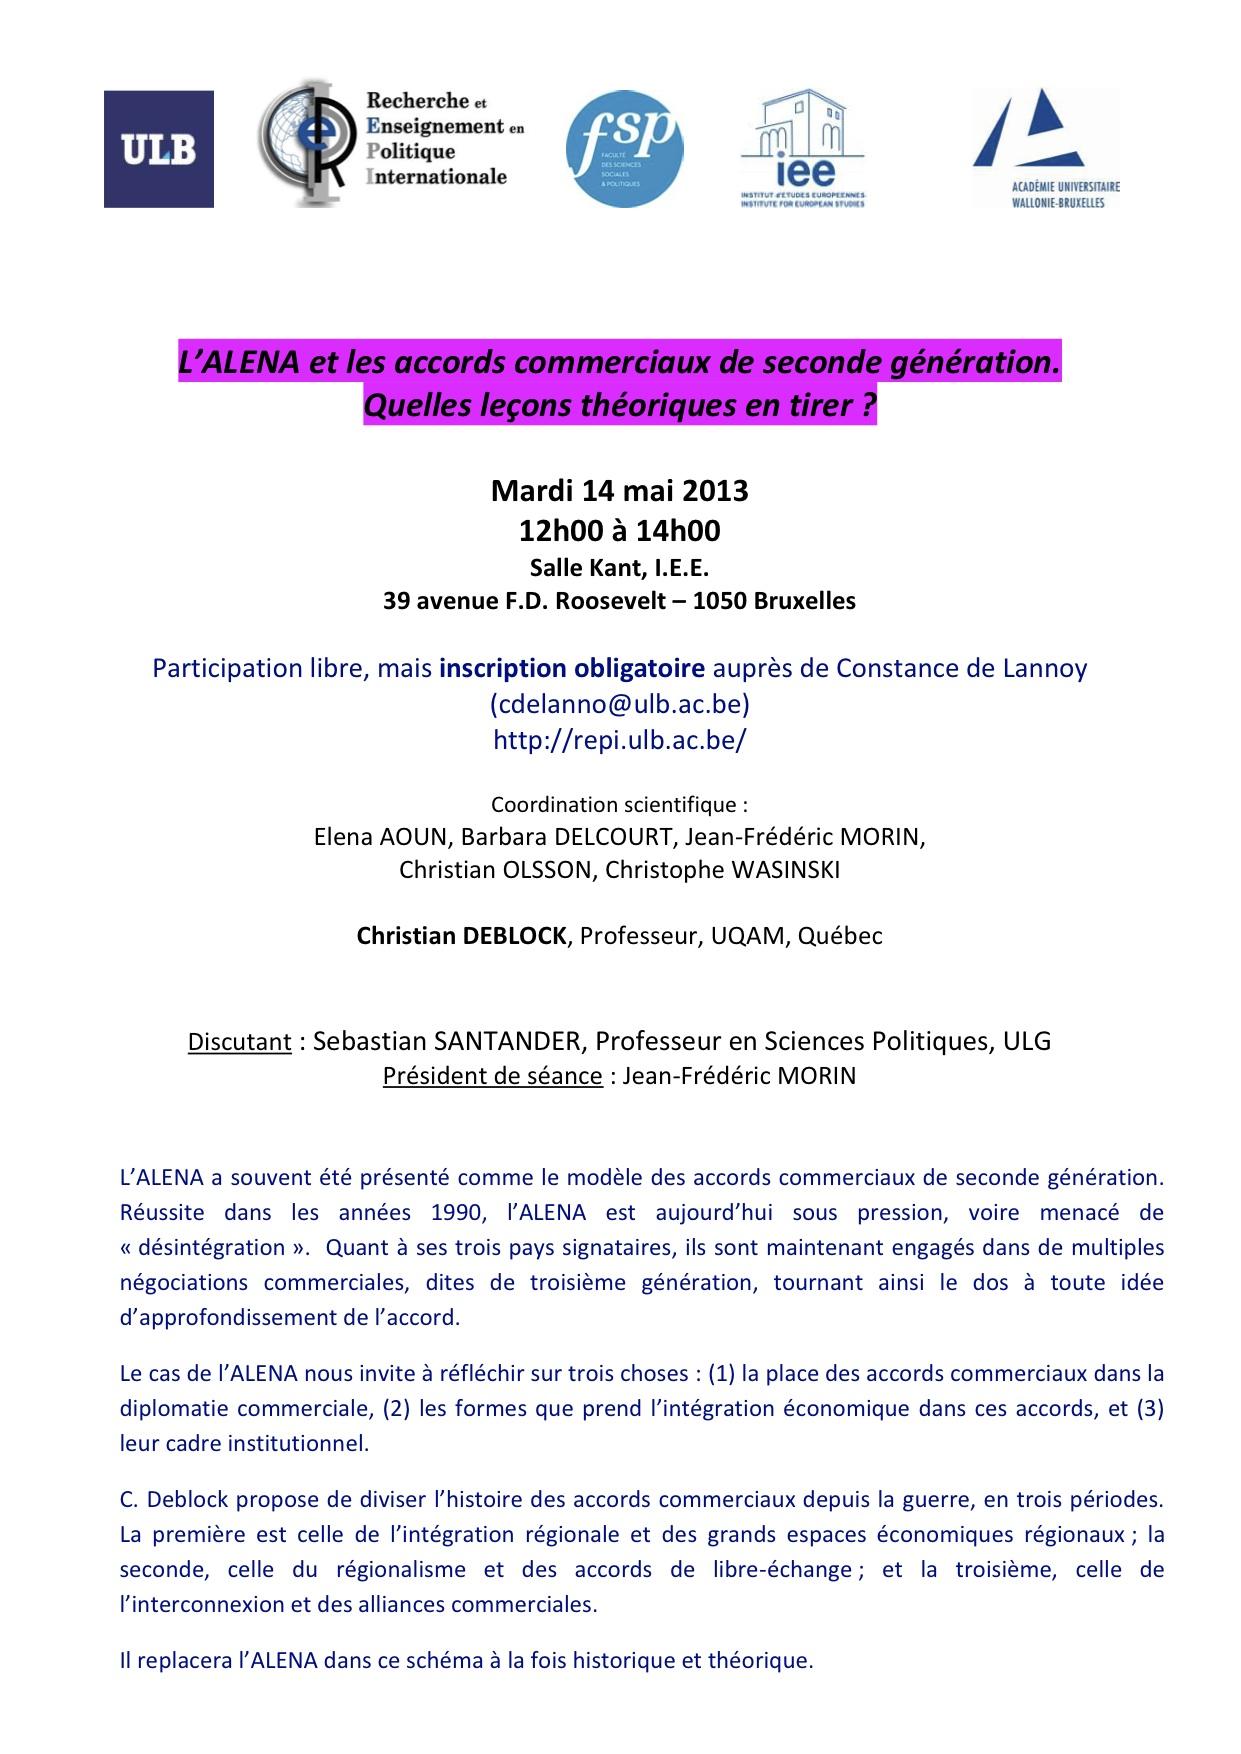 Invitation_14_mai_2013.jpg